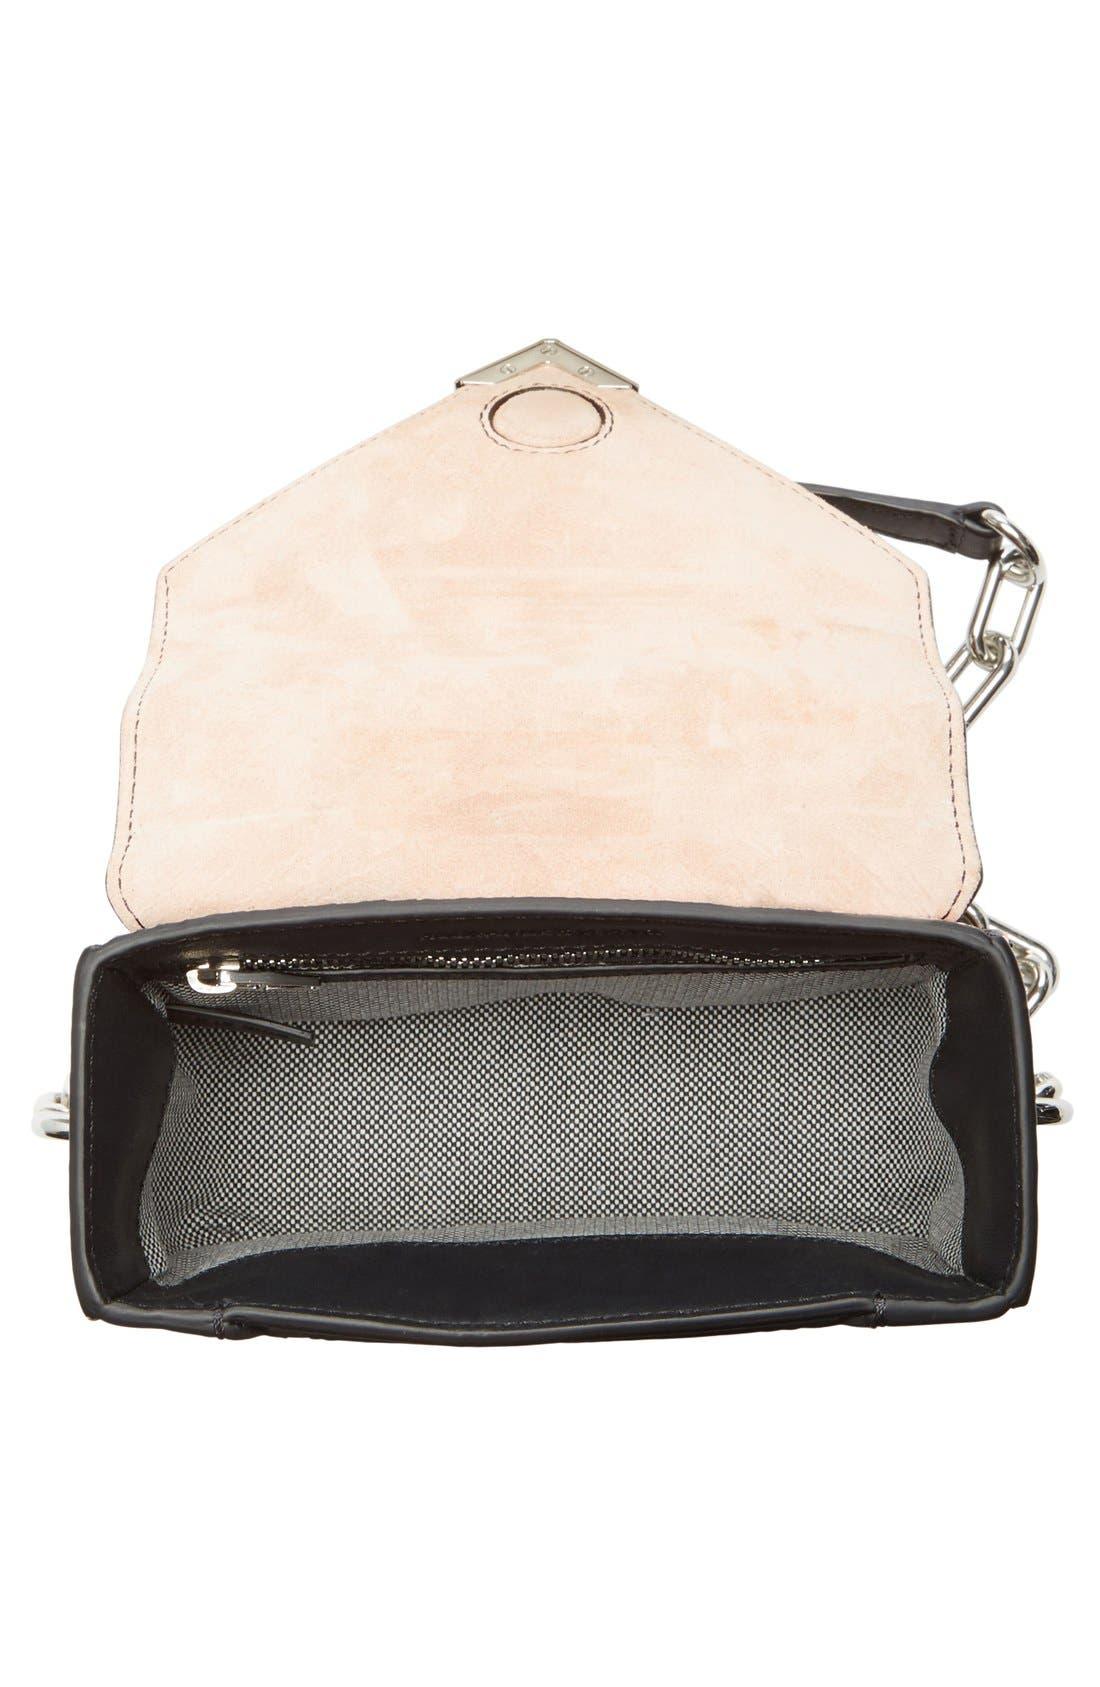 Alternate Image 3  - Alexander Wang 'Mini Prisma' Genuine Snakeskin Leather Shoulder/Crossbody Bag